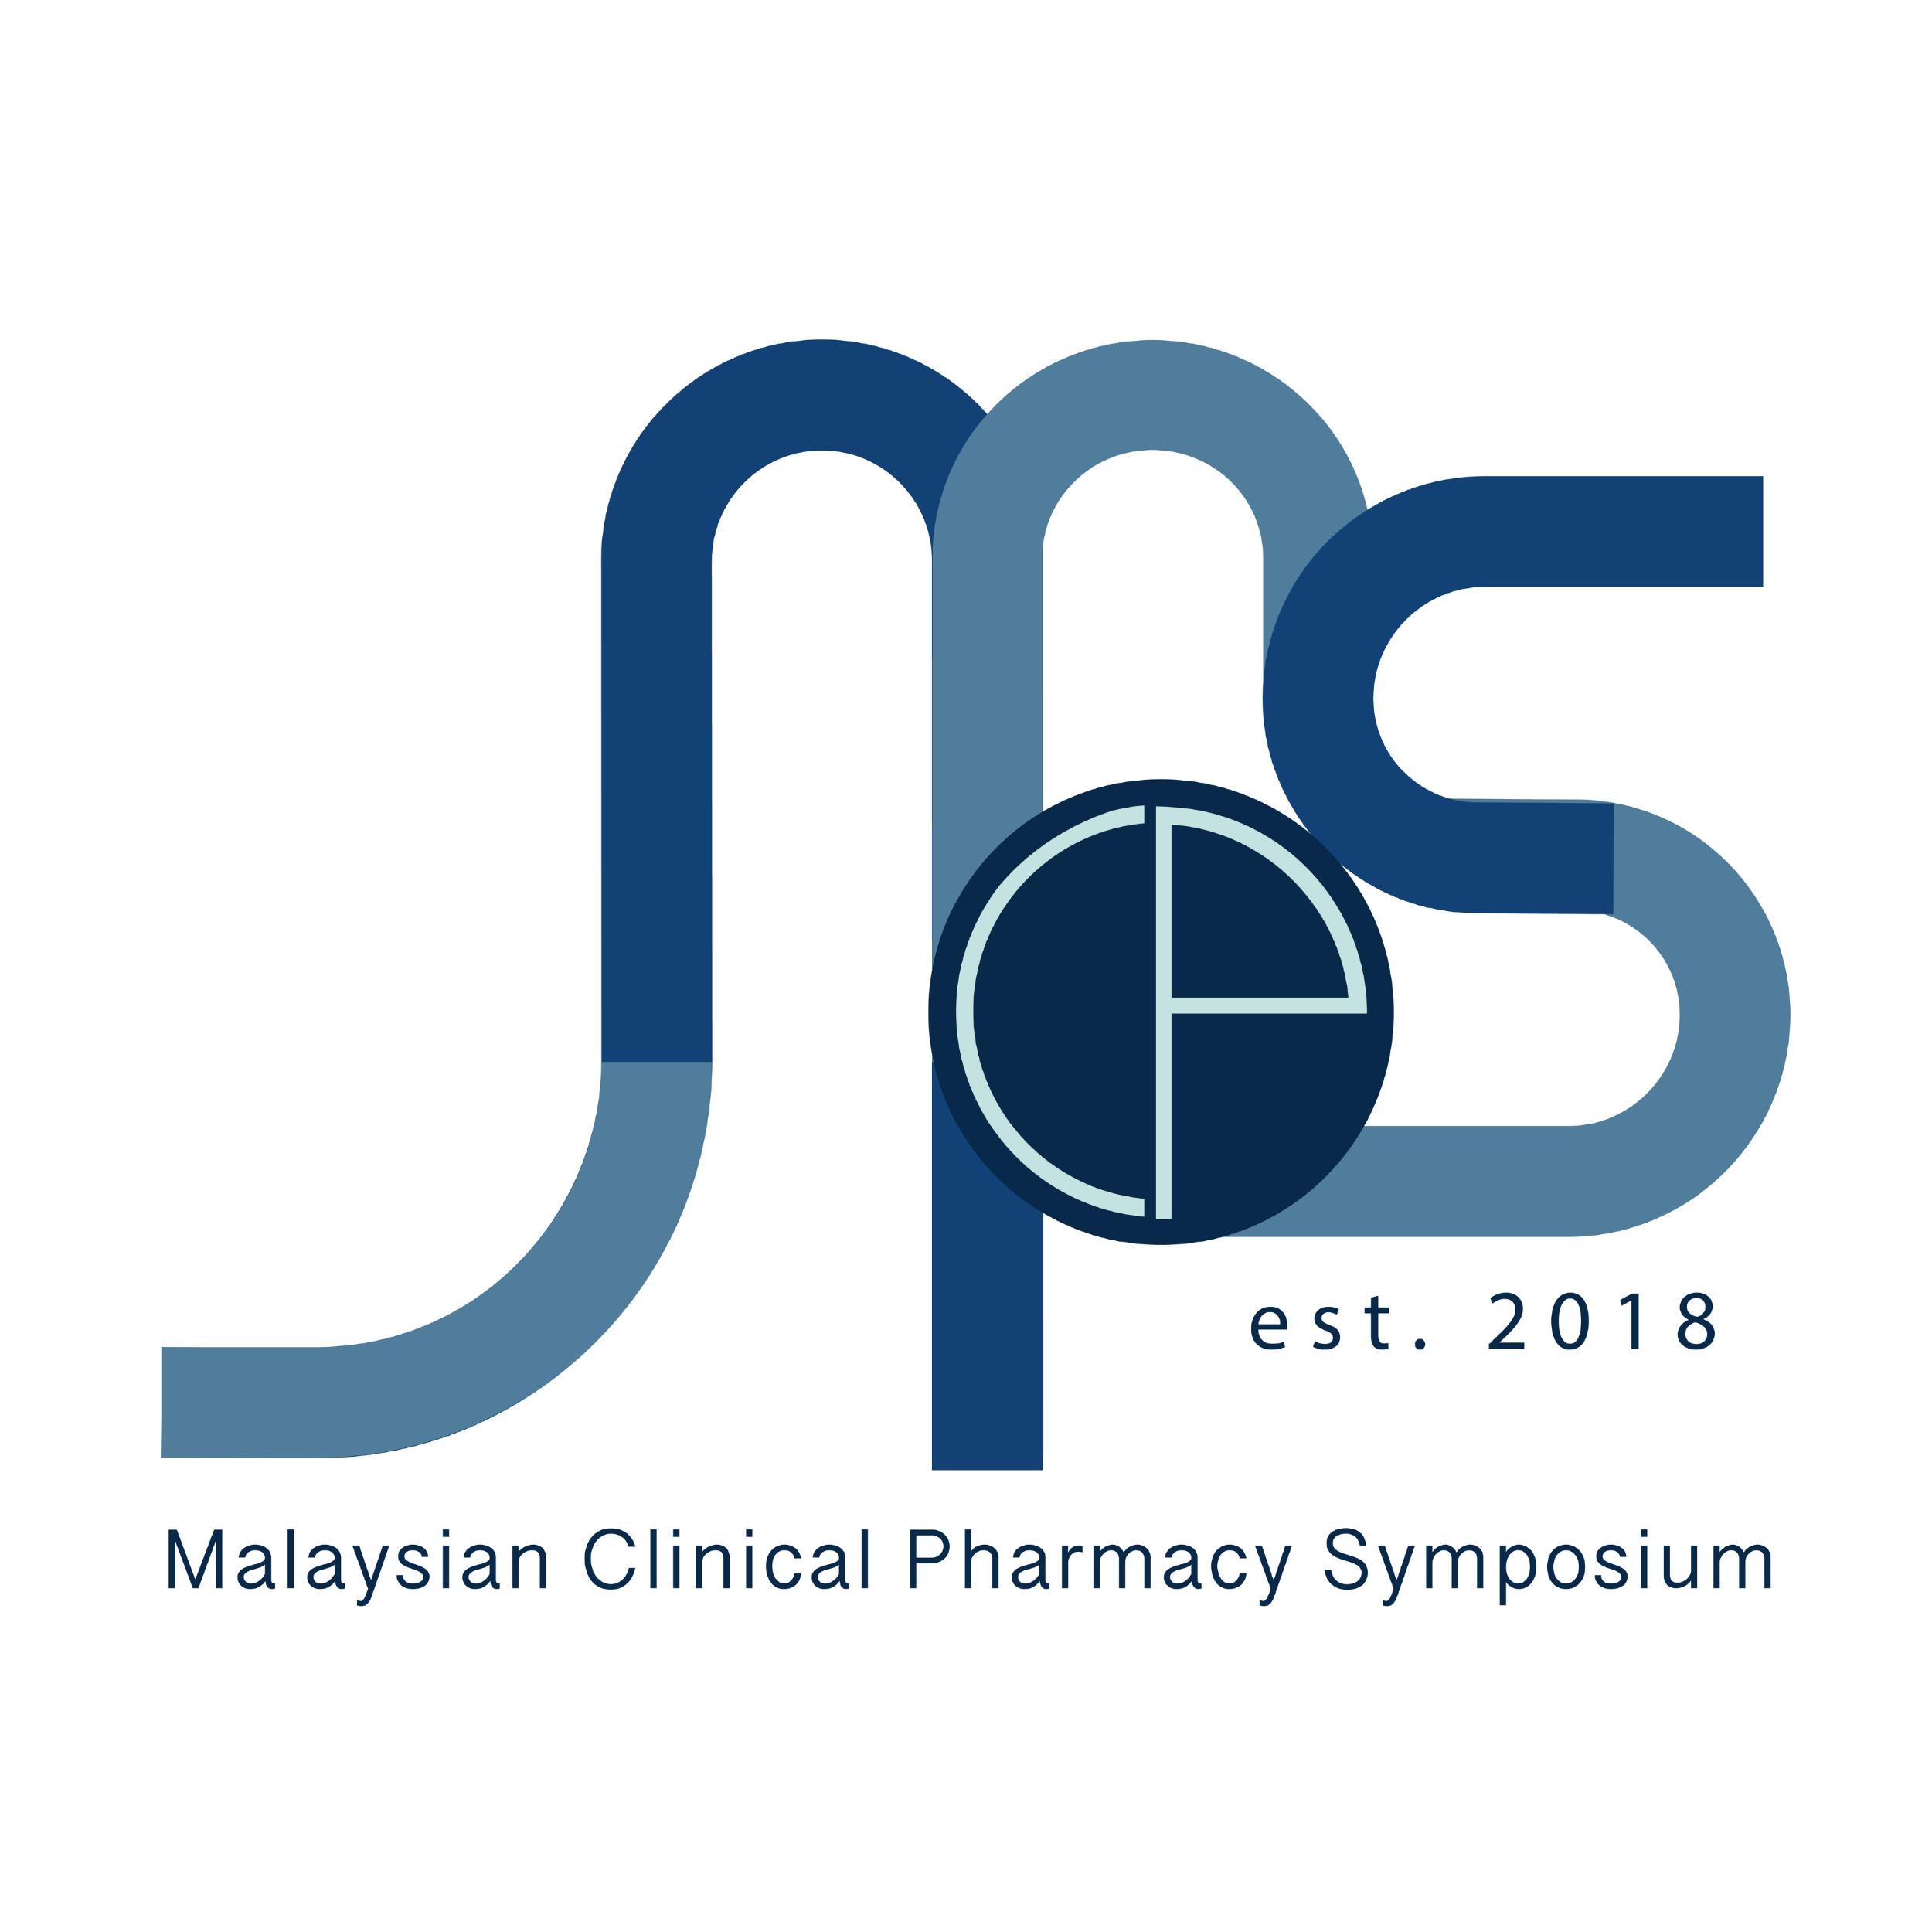 Malaysian Clinical Pharmacy Symposium (MCPS)